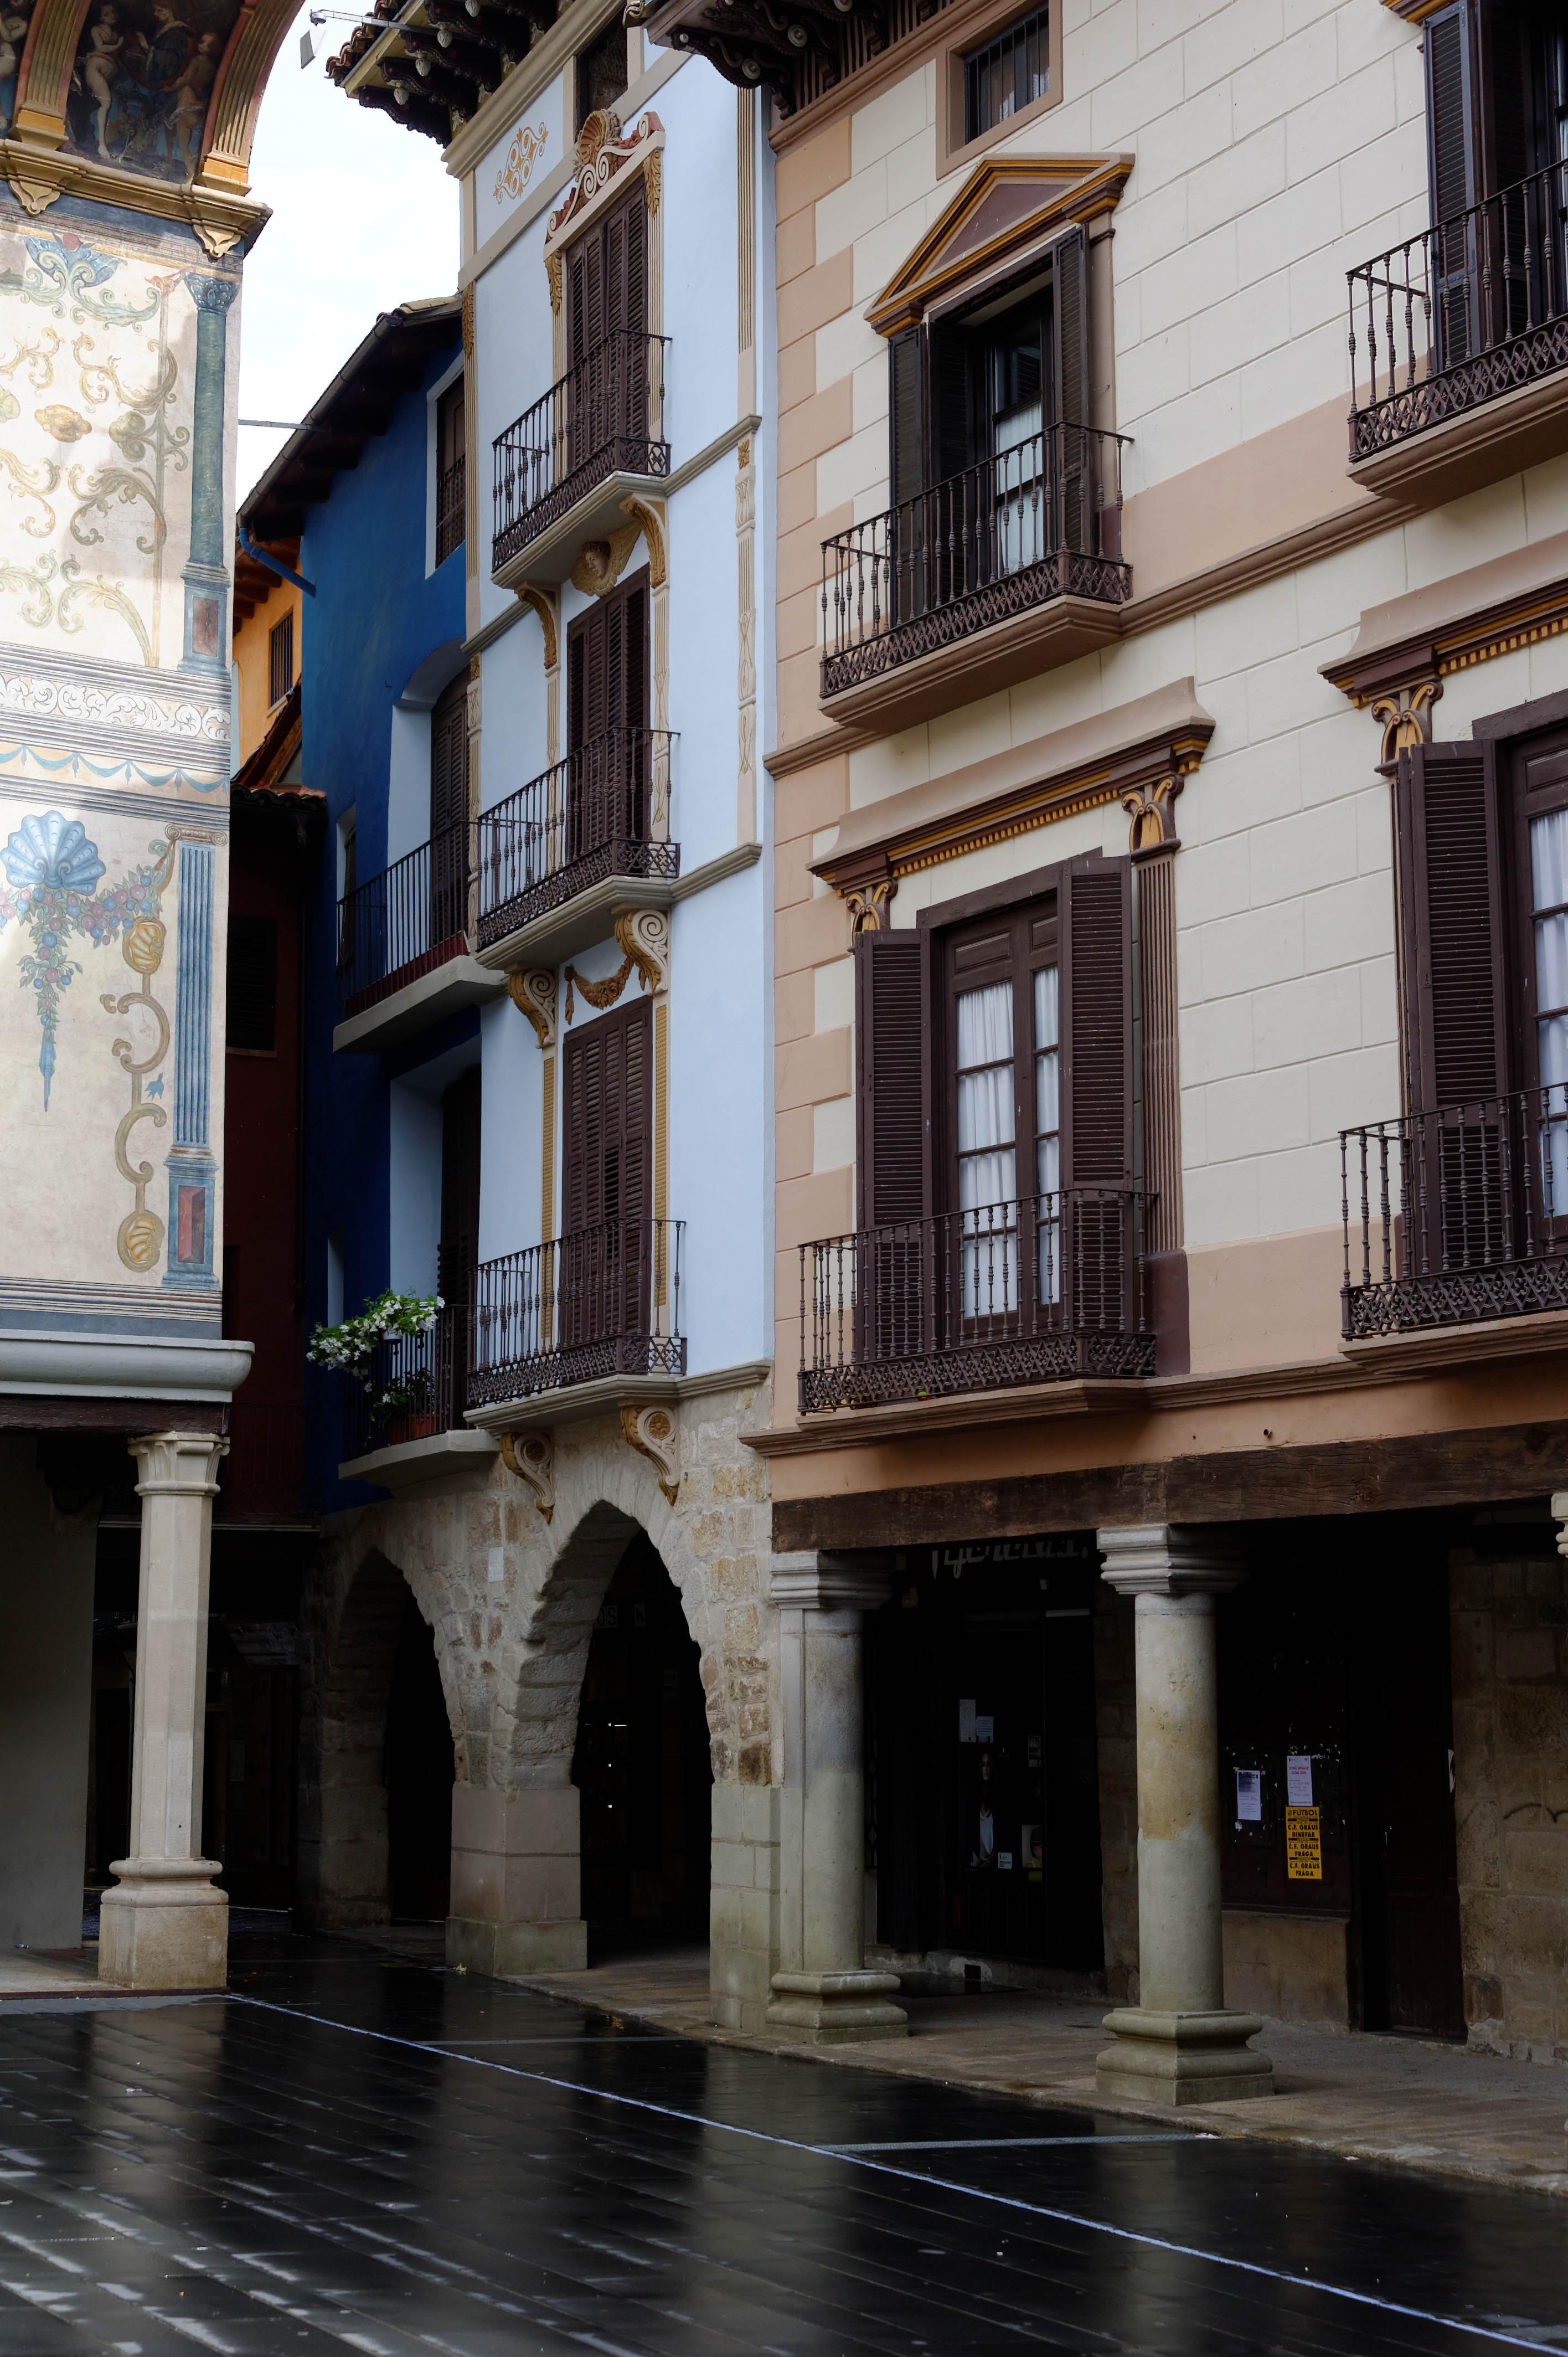 4320_Graus (Aragon)